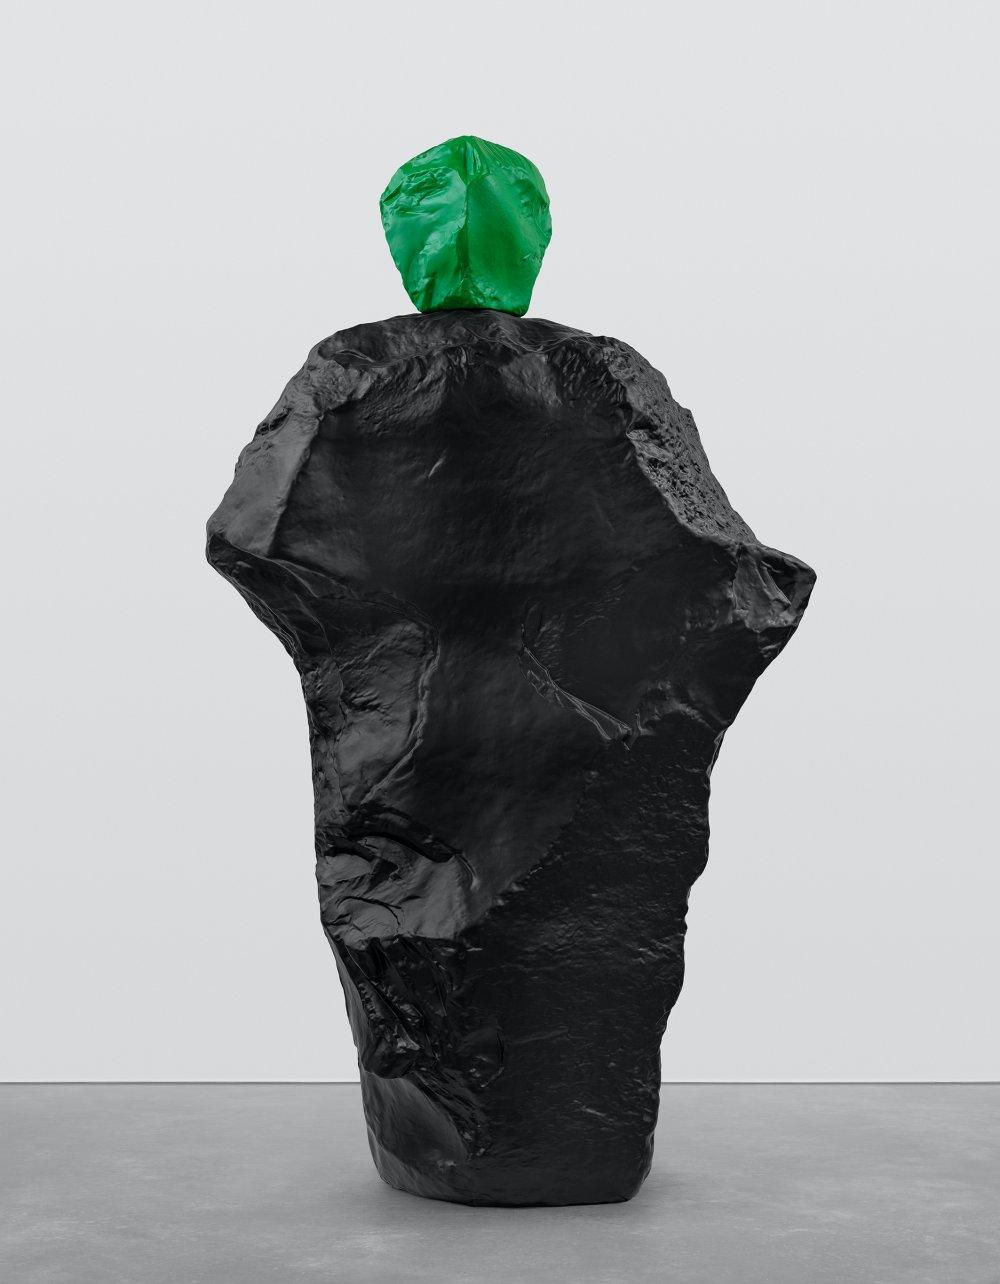 green black monk